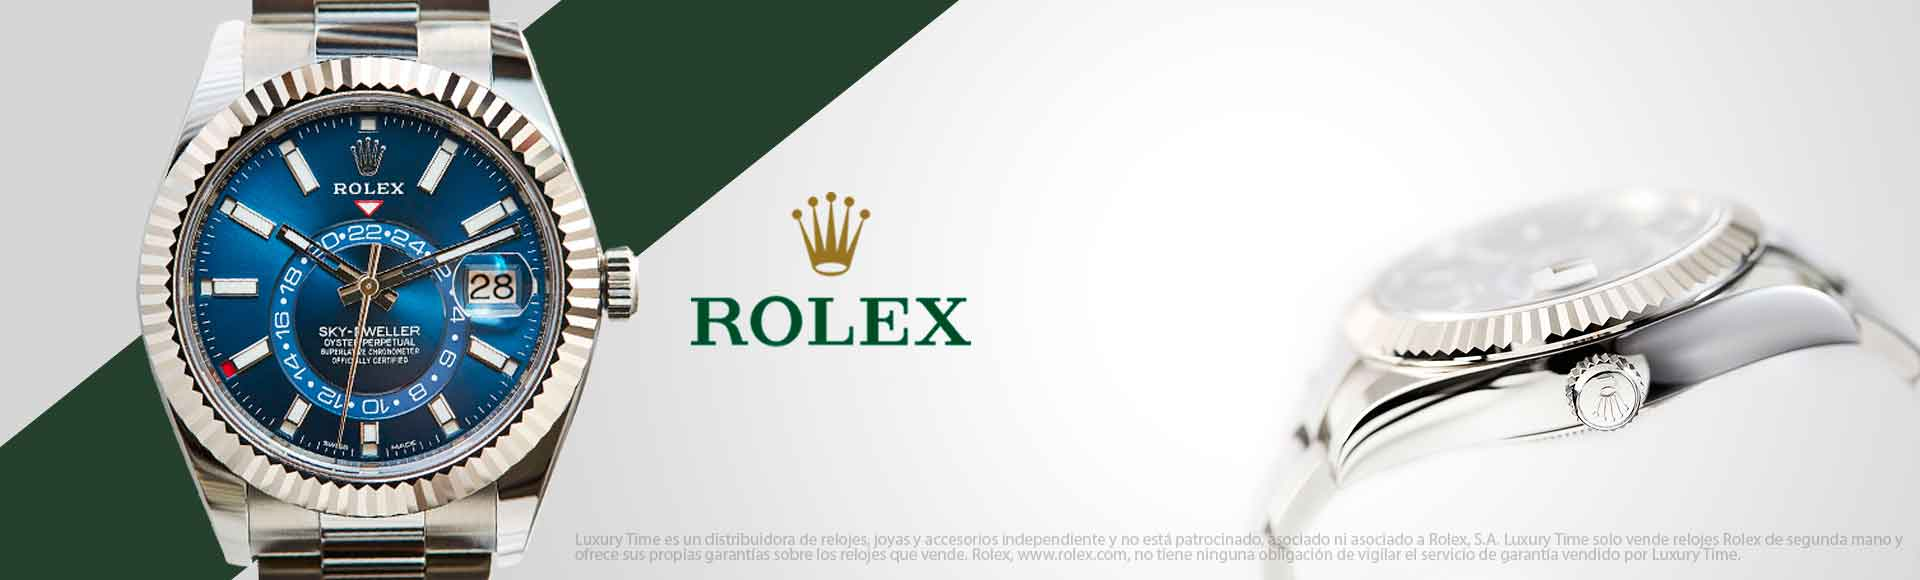 Rolex Luxury Time